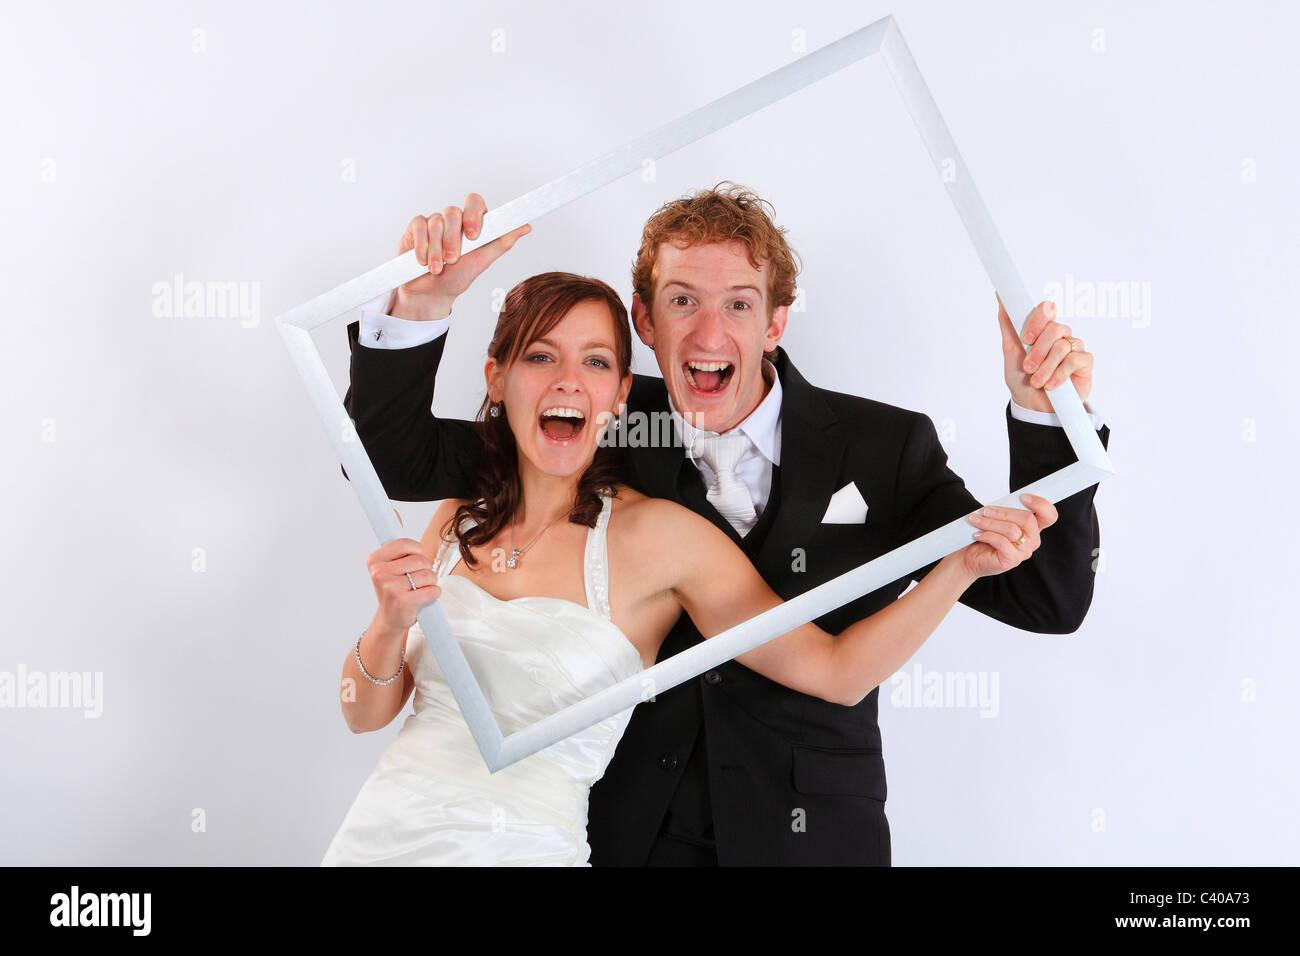 Bild, Bilderrahmen, Braut, Braut und Bräutigam, heiraten, Bräutigam ...